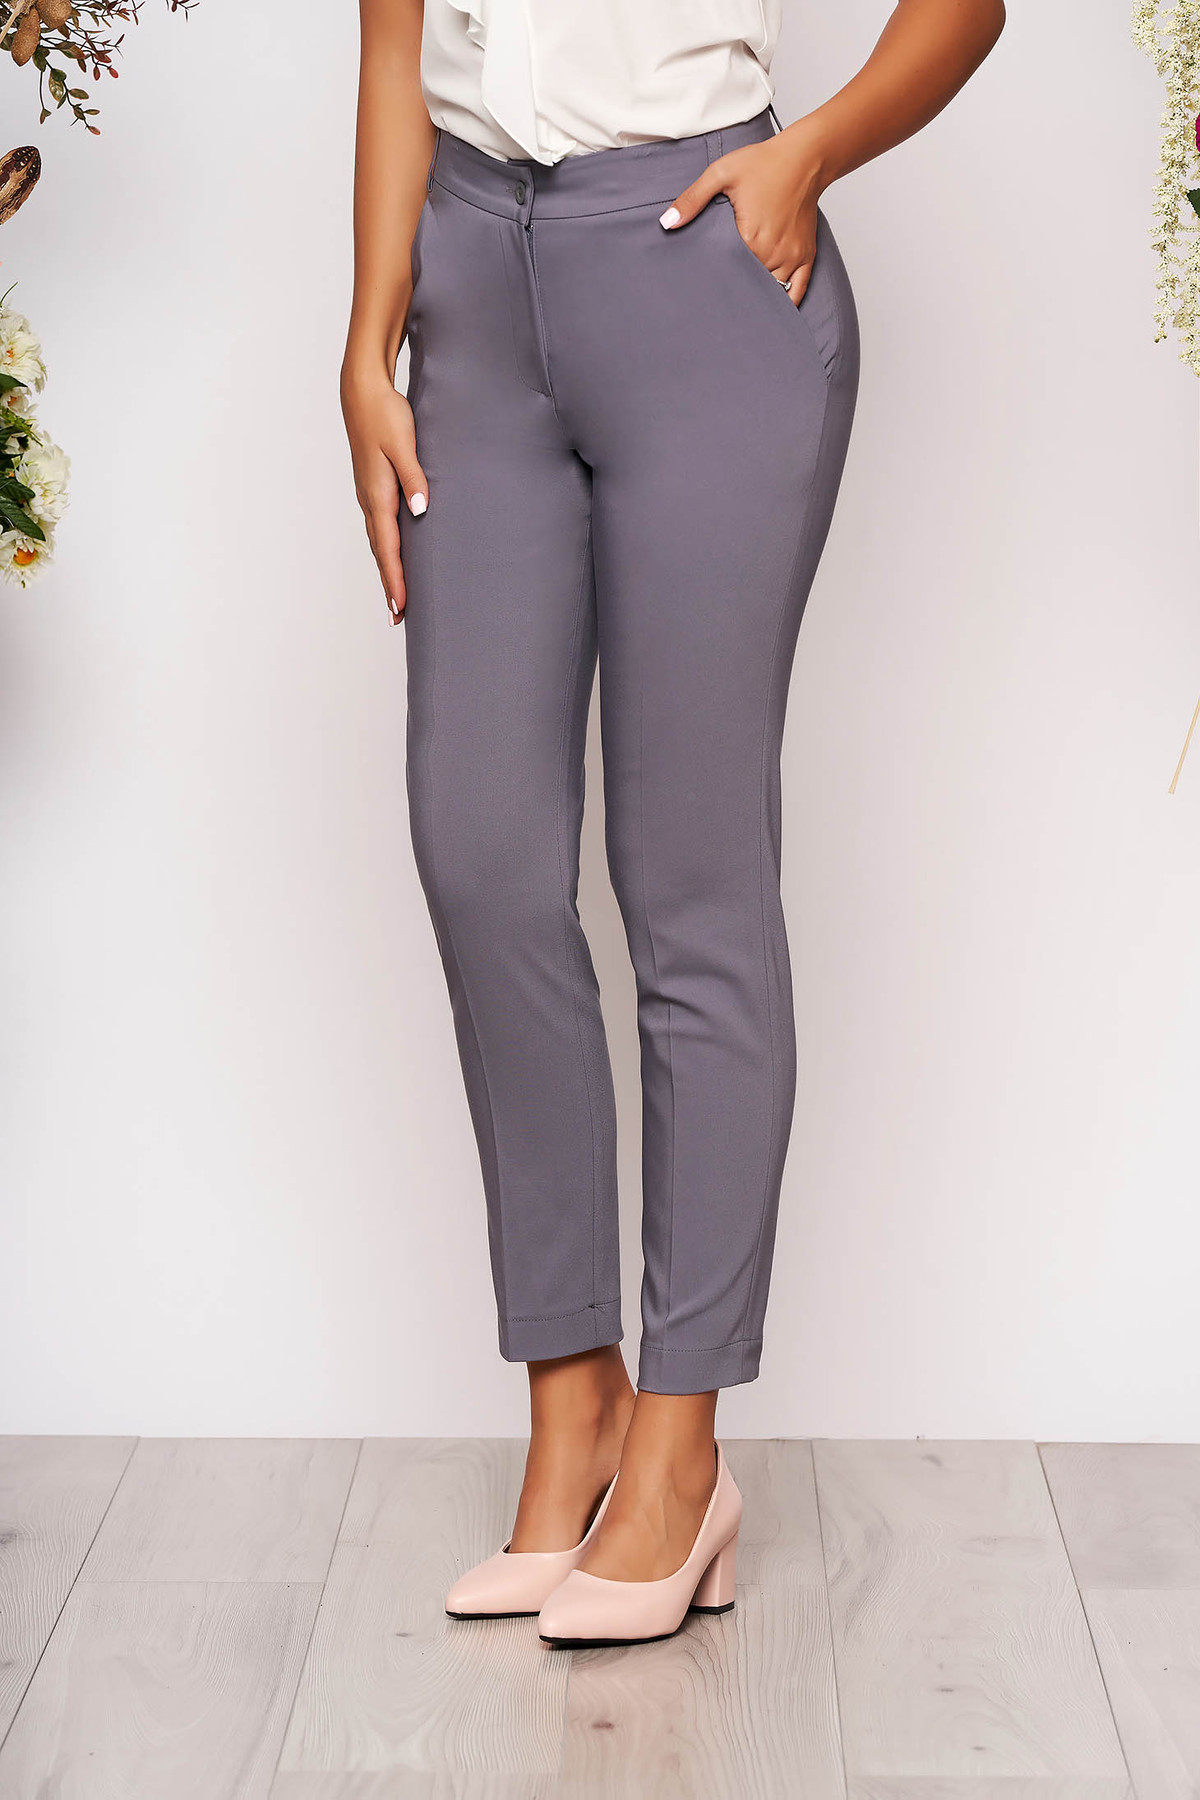 Pantaloni gri lungi eleganti cu talie medie conici din stofa subtire cu buzunare